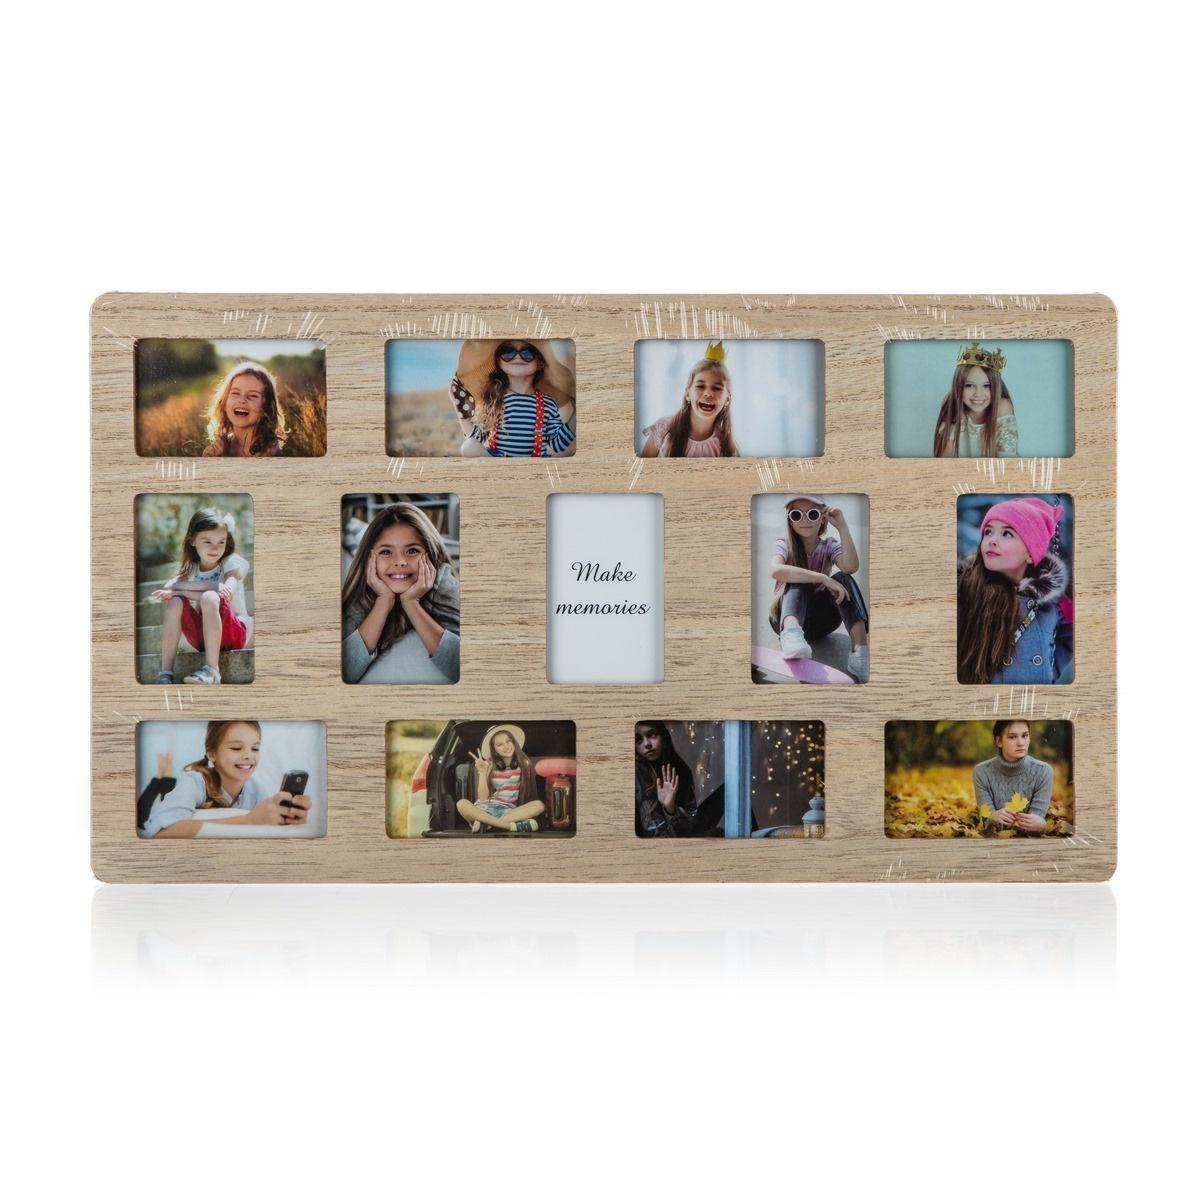 Home Decor Fotorámeček na 13 fotografií Teenager, 30 x 20 cm